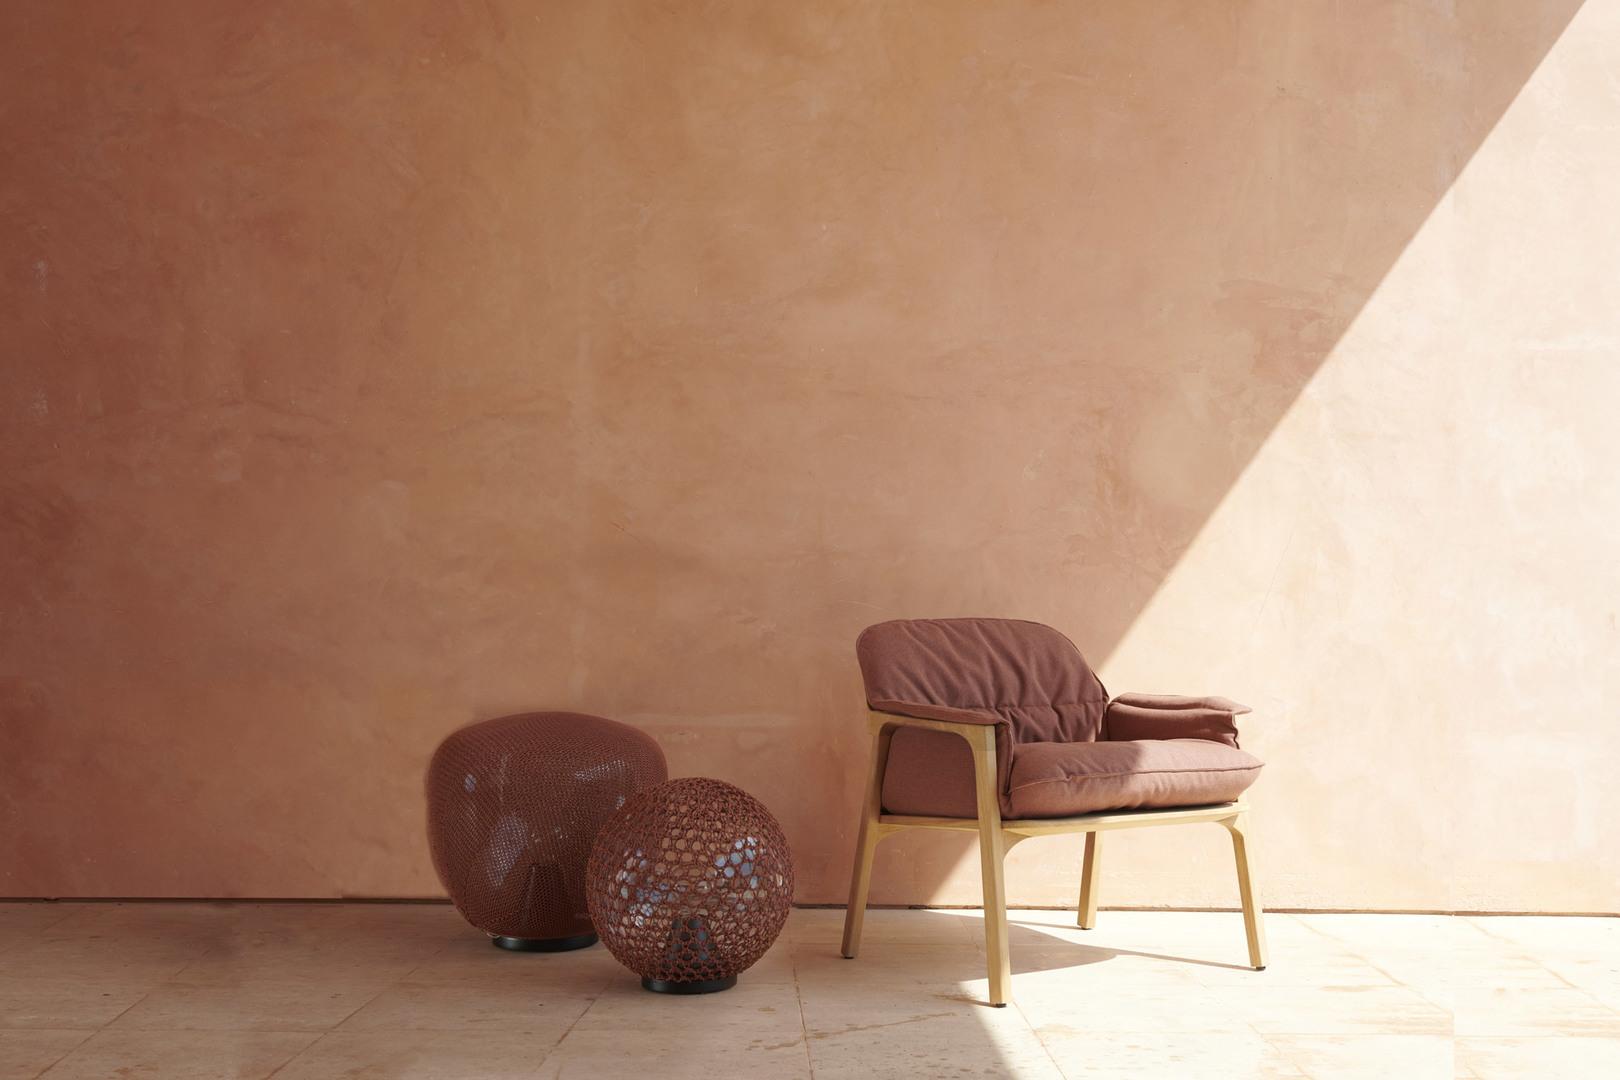 Tribu-Nomad-chair-1.jpg